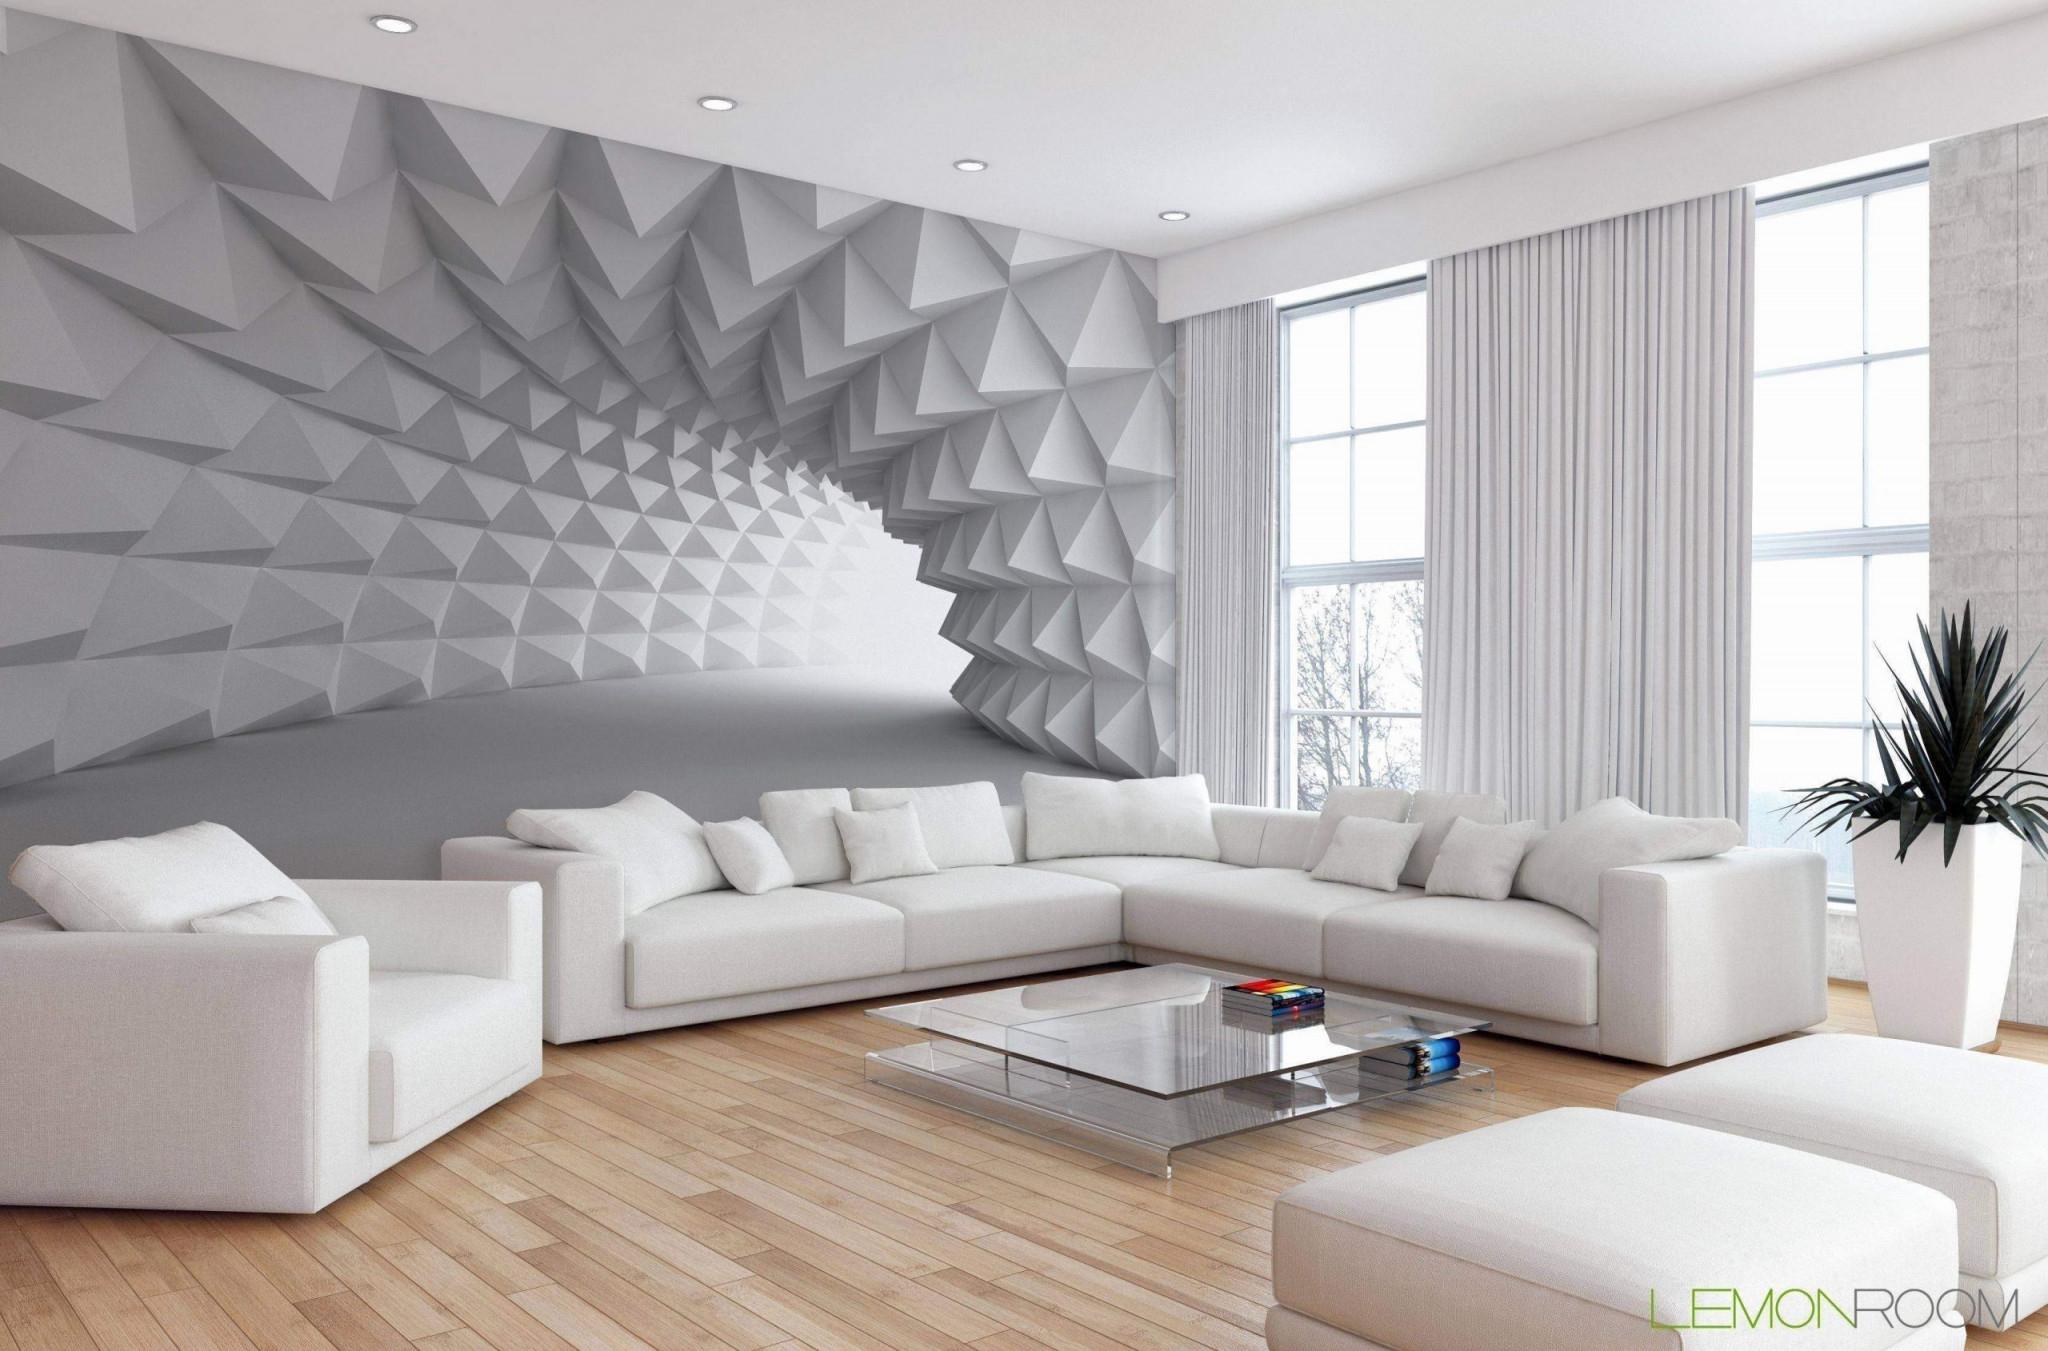 Tapeten Ideen Wohnzimmer In 2020  Design Living Room von Tapeten Wohnzimmer Ideen Photo